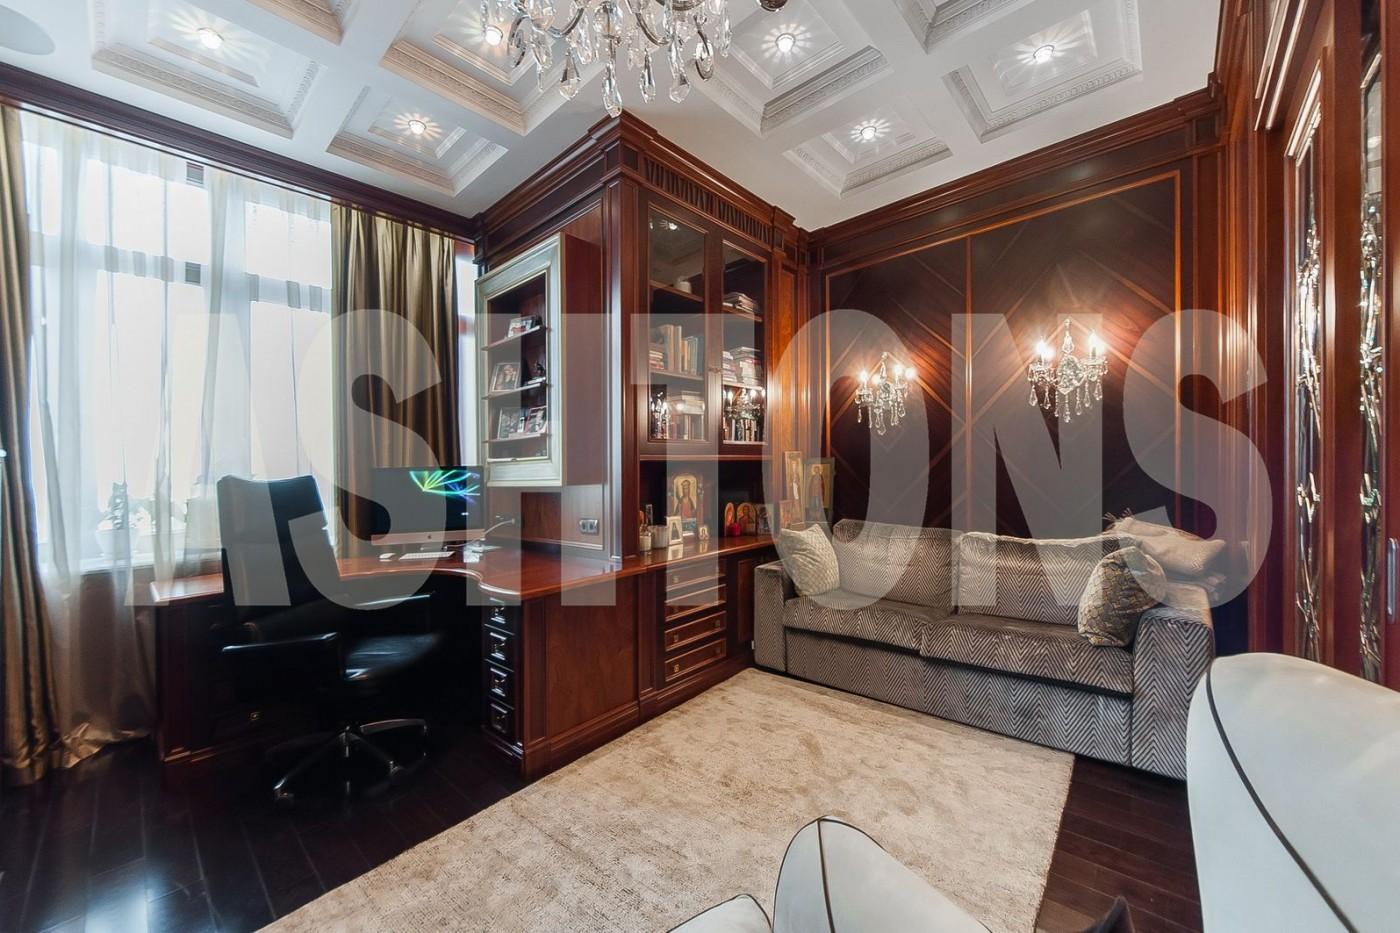 аренда квартиры в центре Москвы ashtons.ru Ashtons international realty